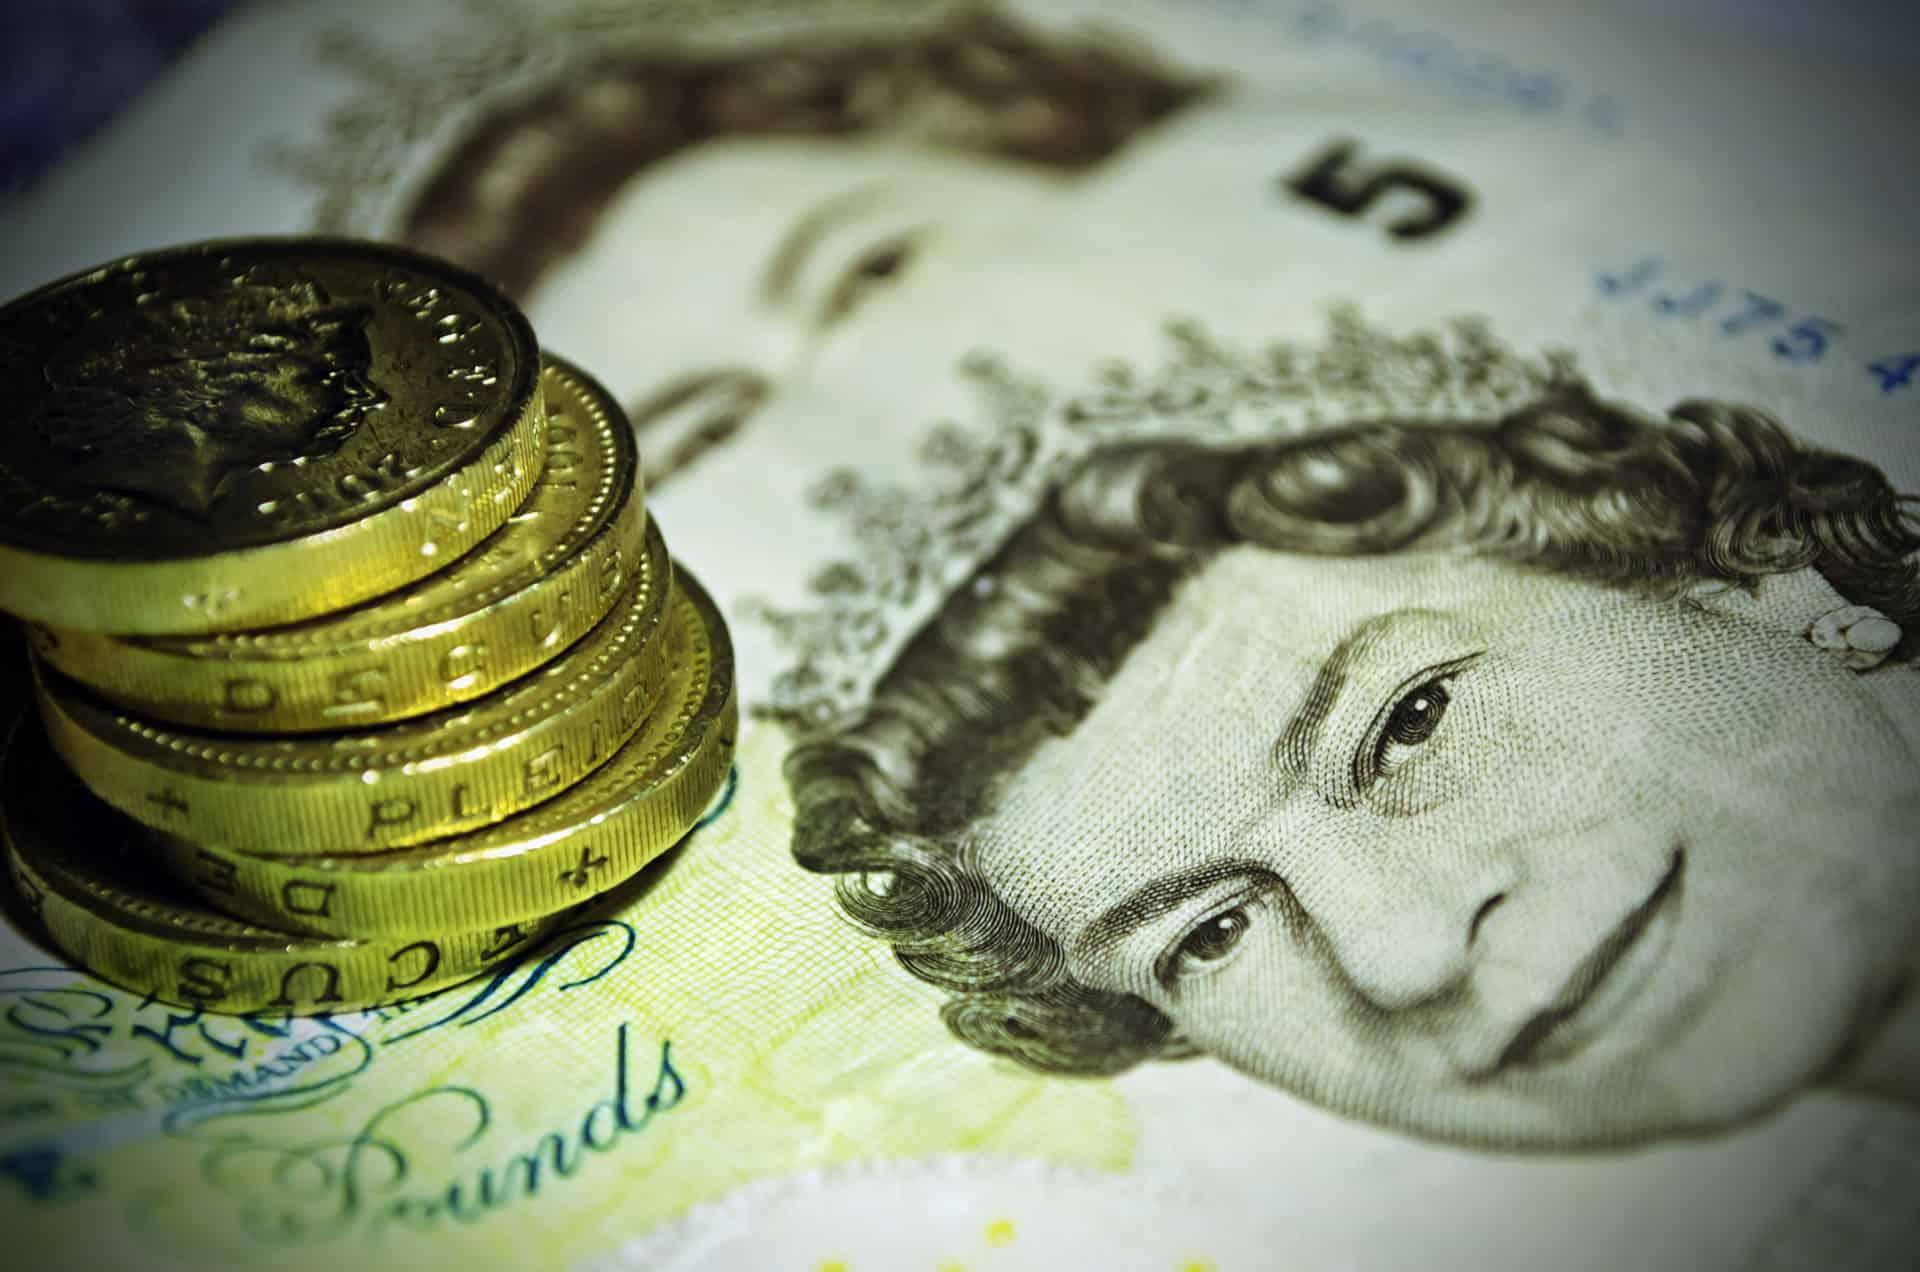 £5-note-pound-coins-cash